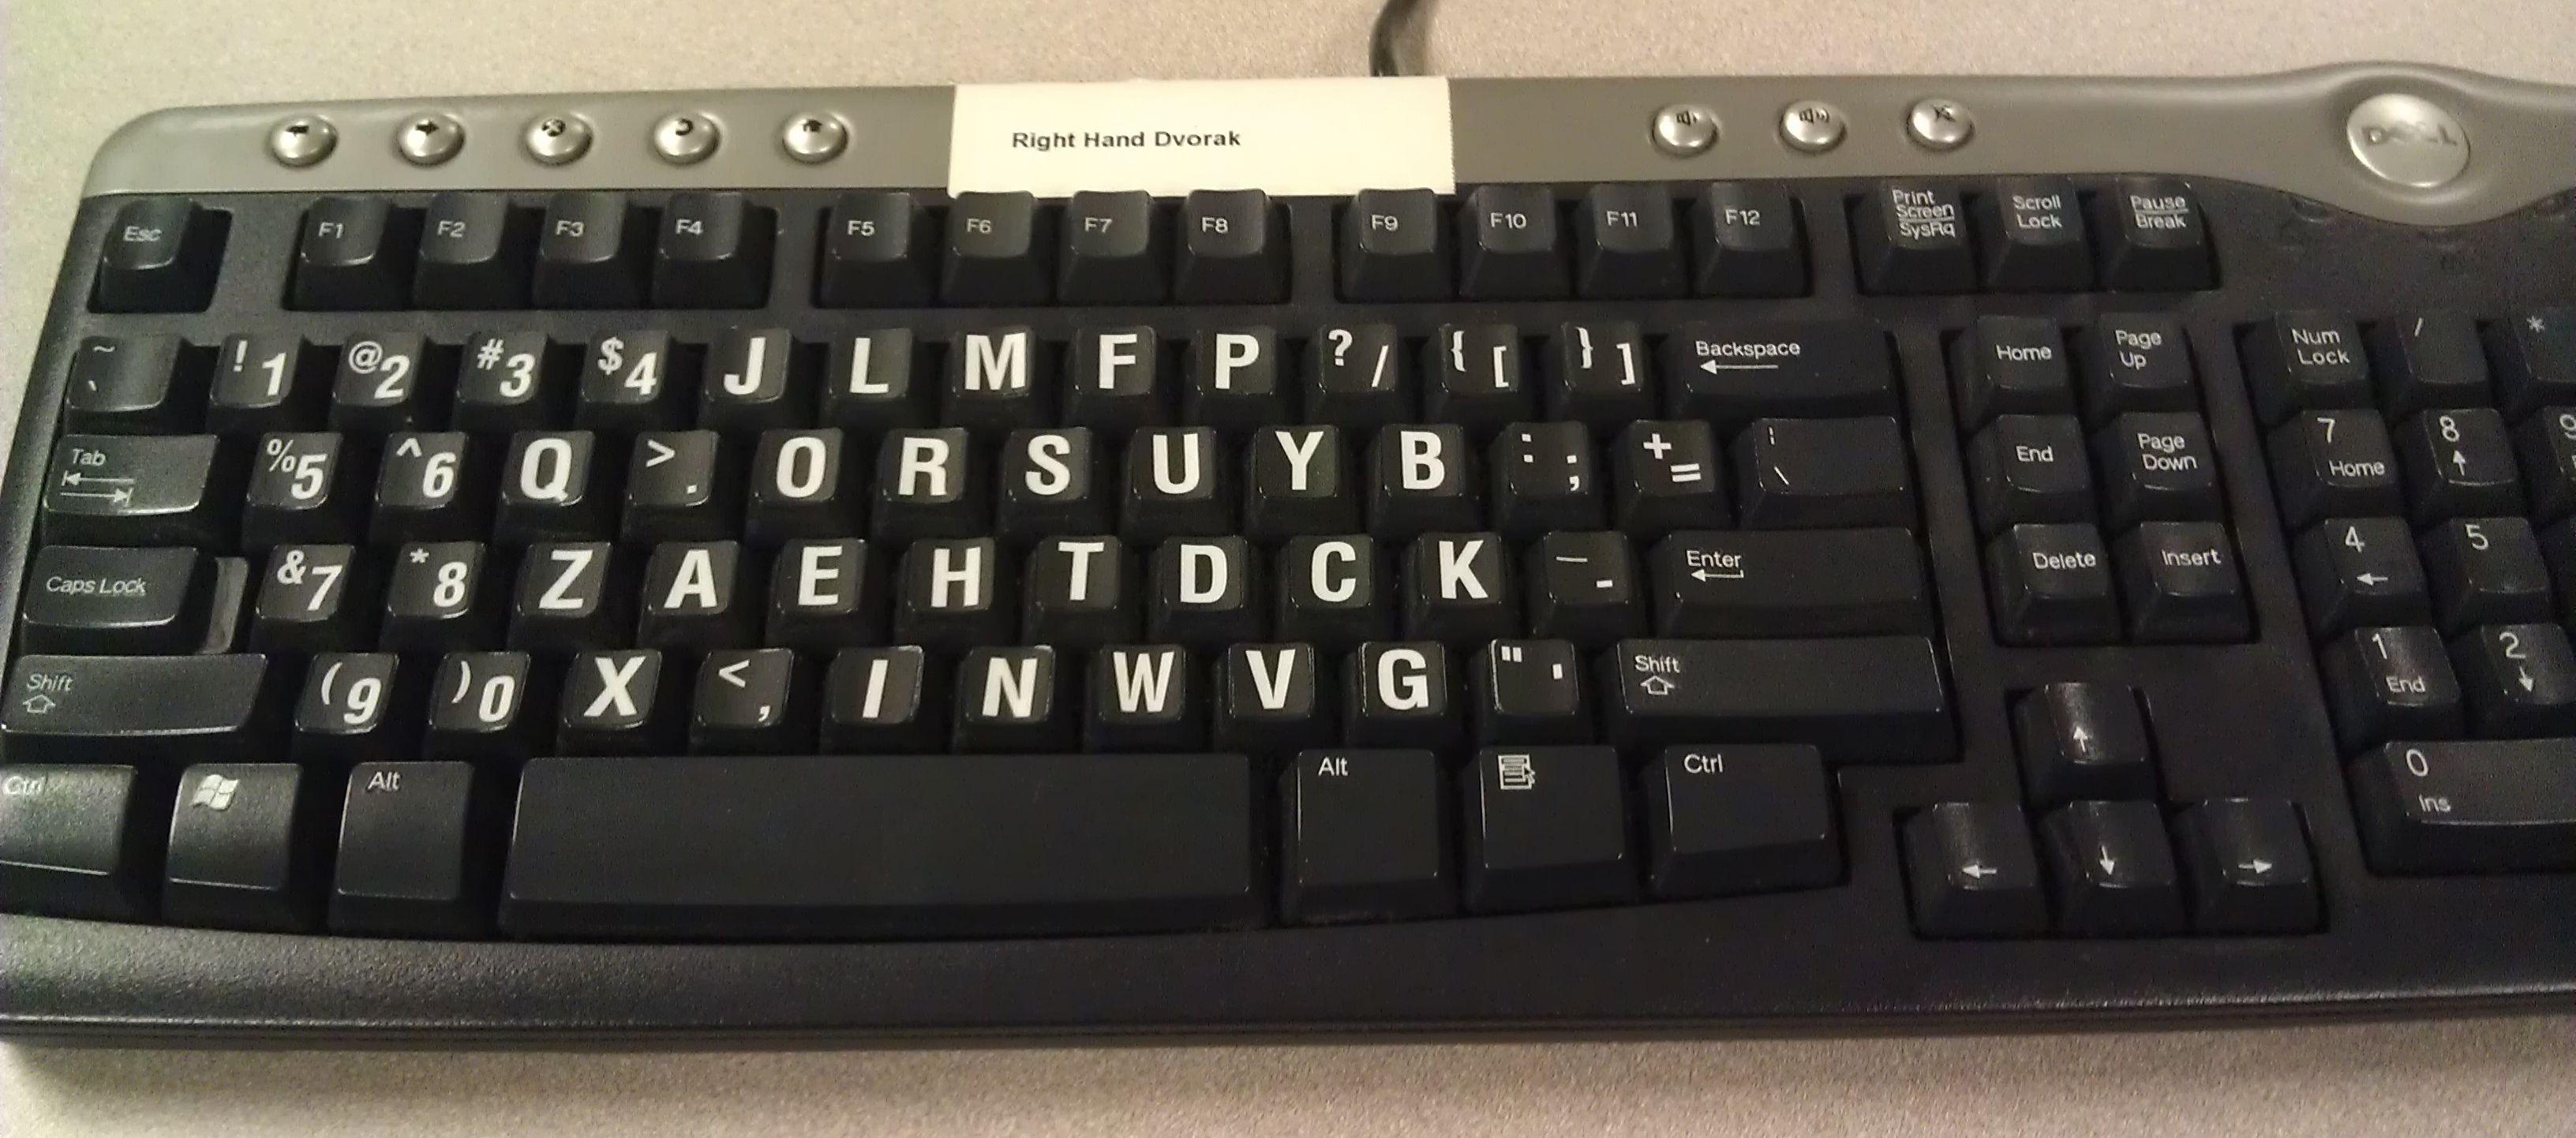 Right Handed Dvorak Keyboard